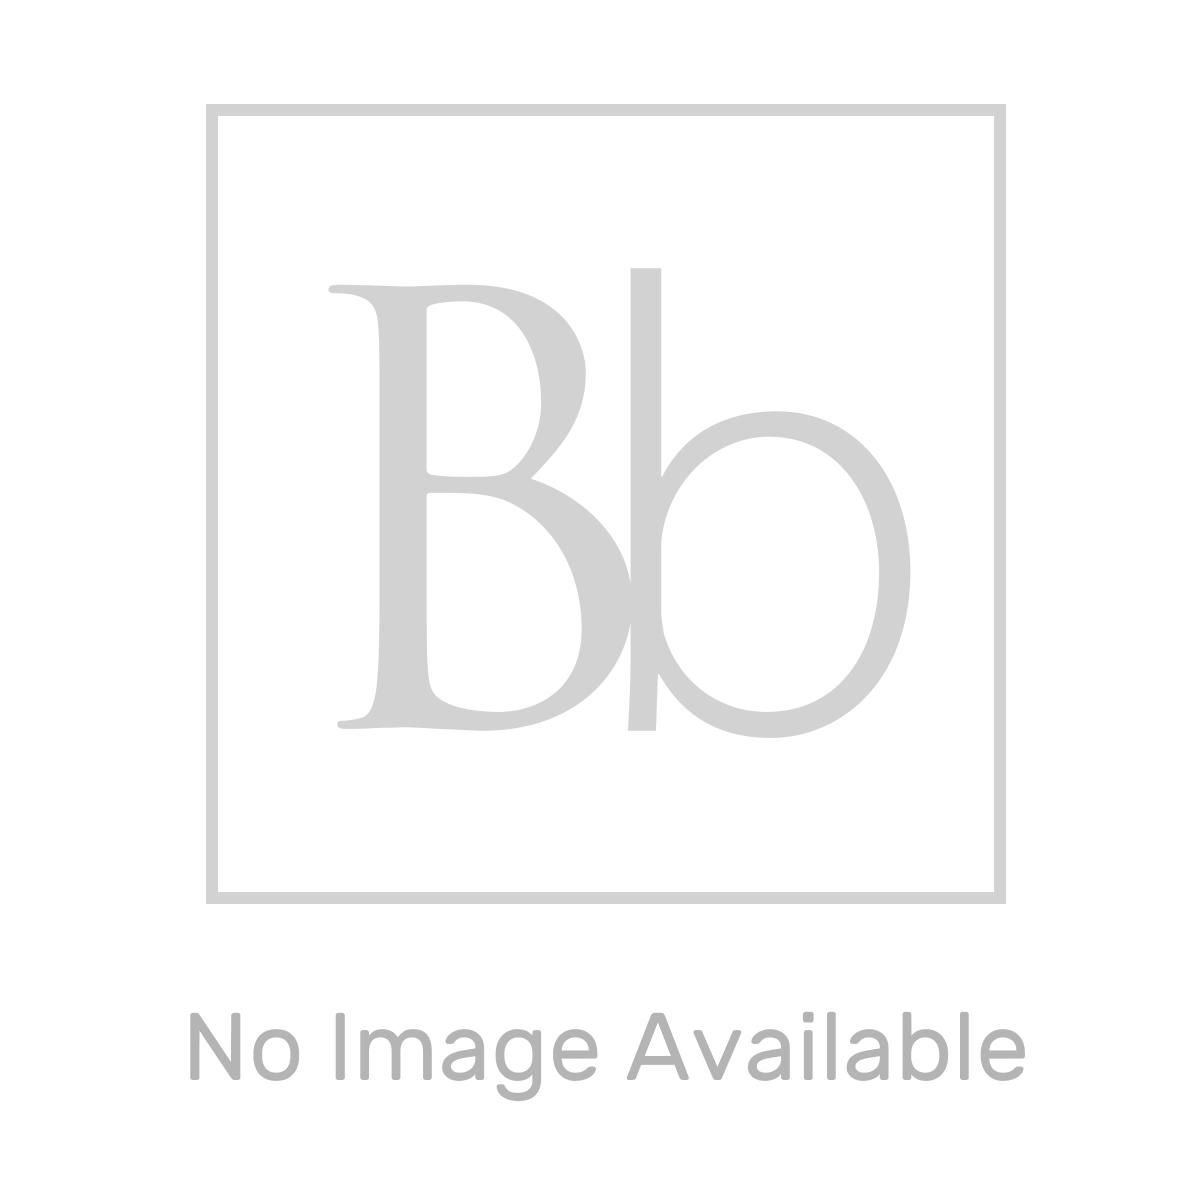 Merlyn Series 6 Offset Quadrant Shower Enclosure